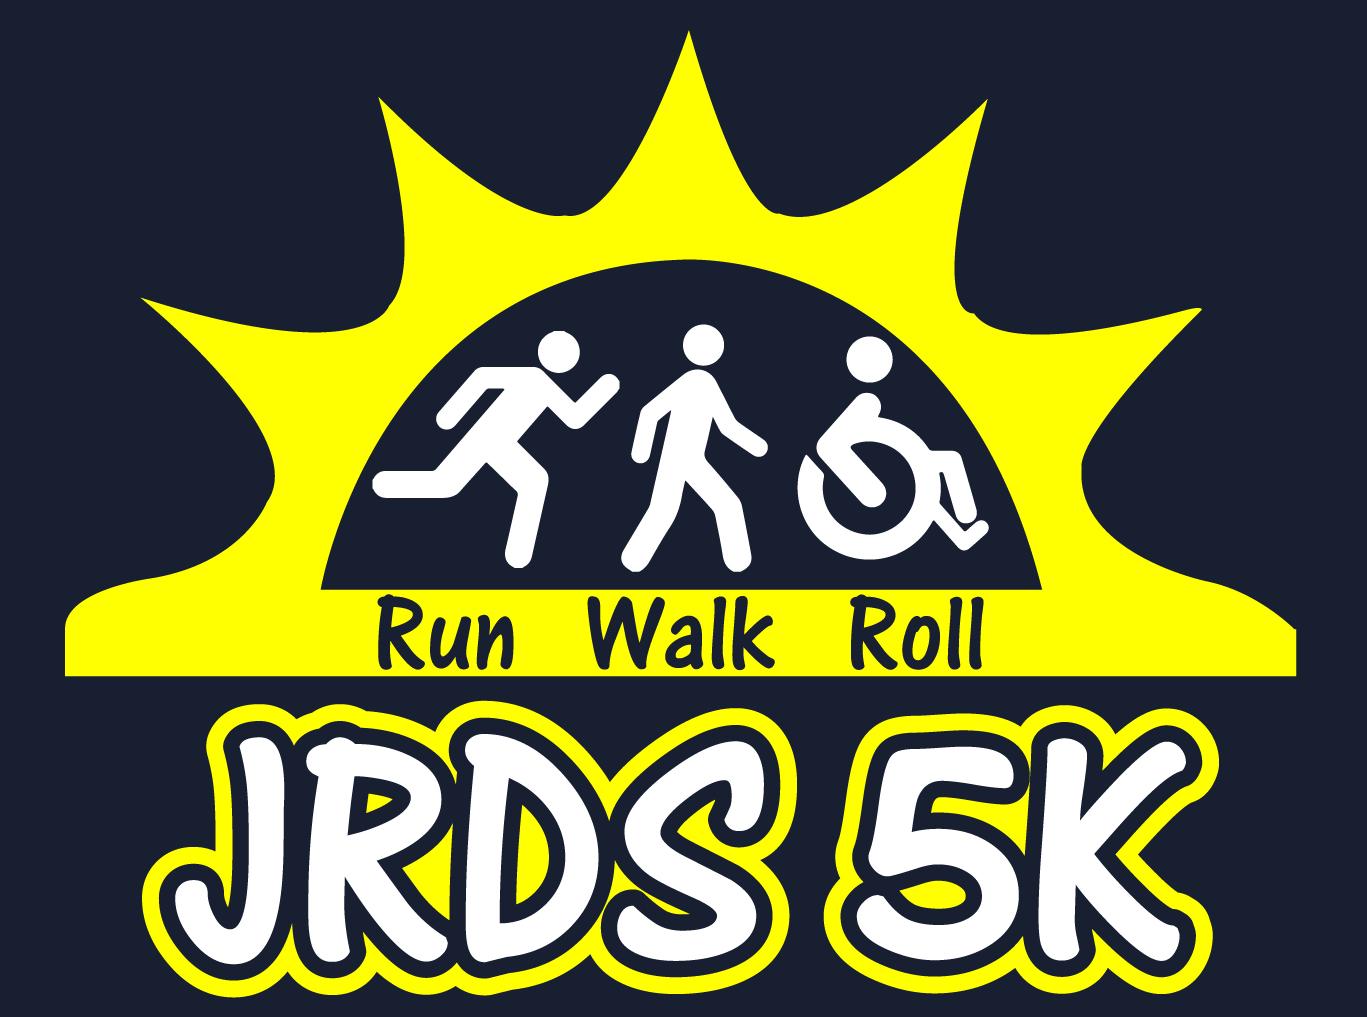 JRDS 5k